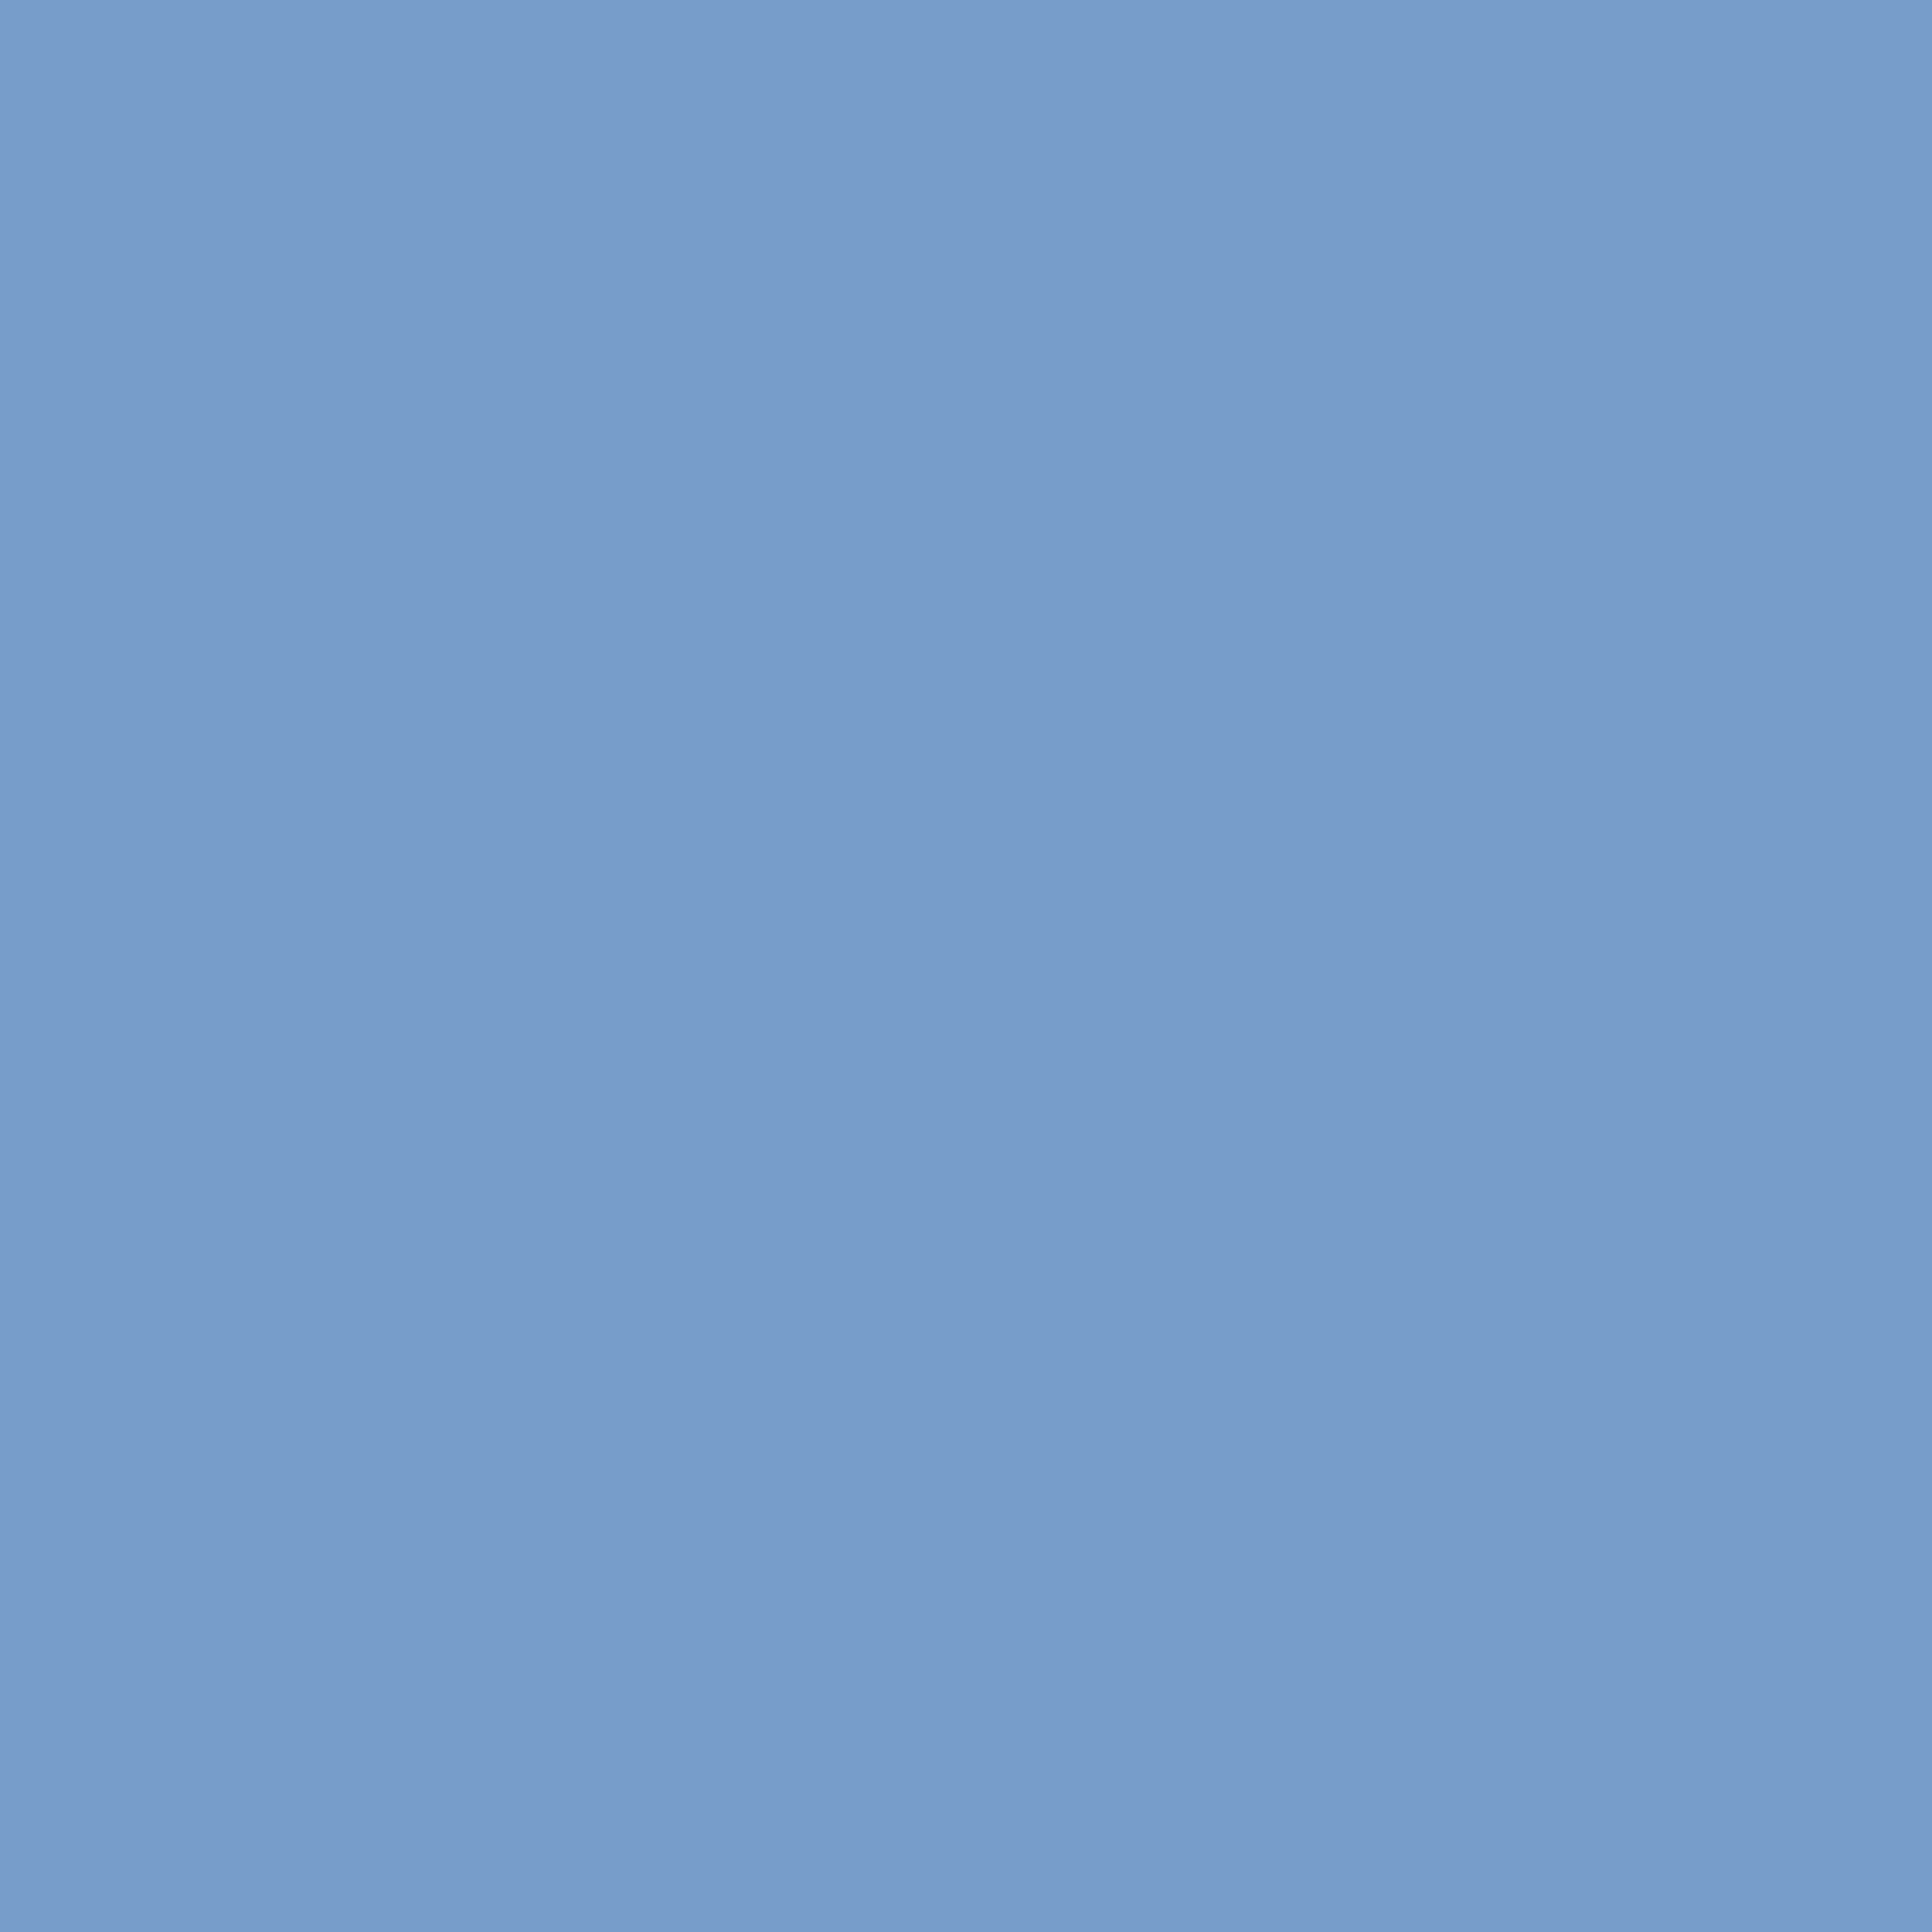 3600x3600 Dark Pastel Blue Solid Color Background